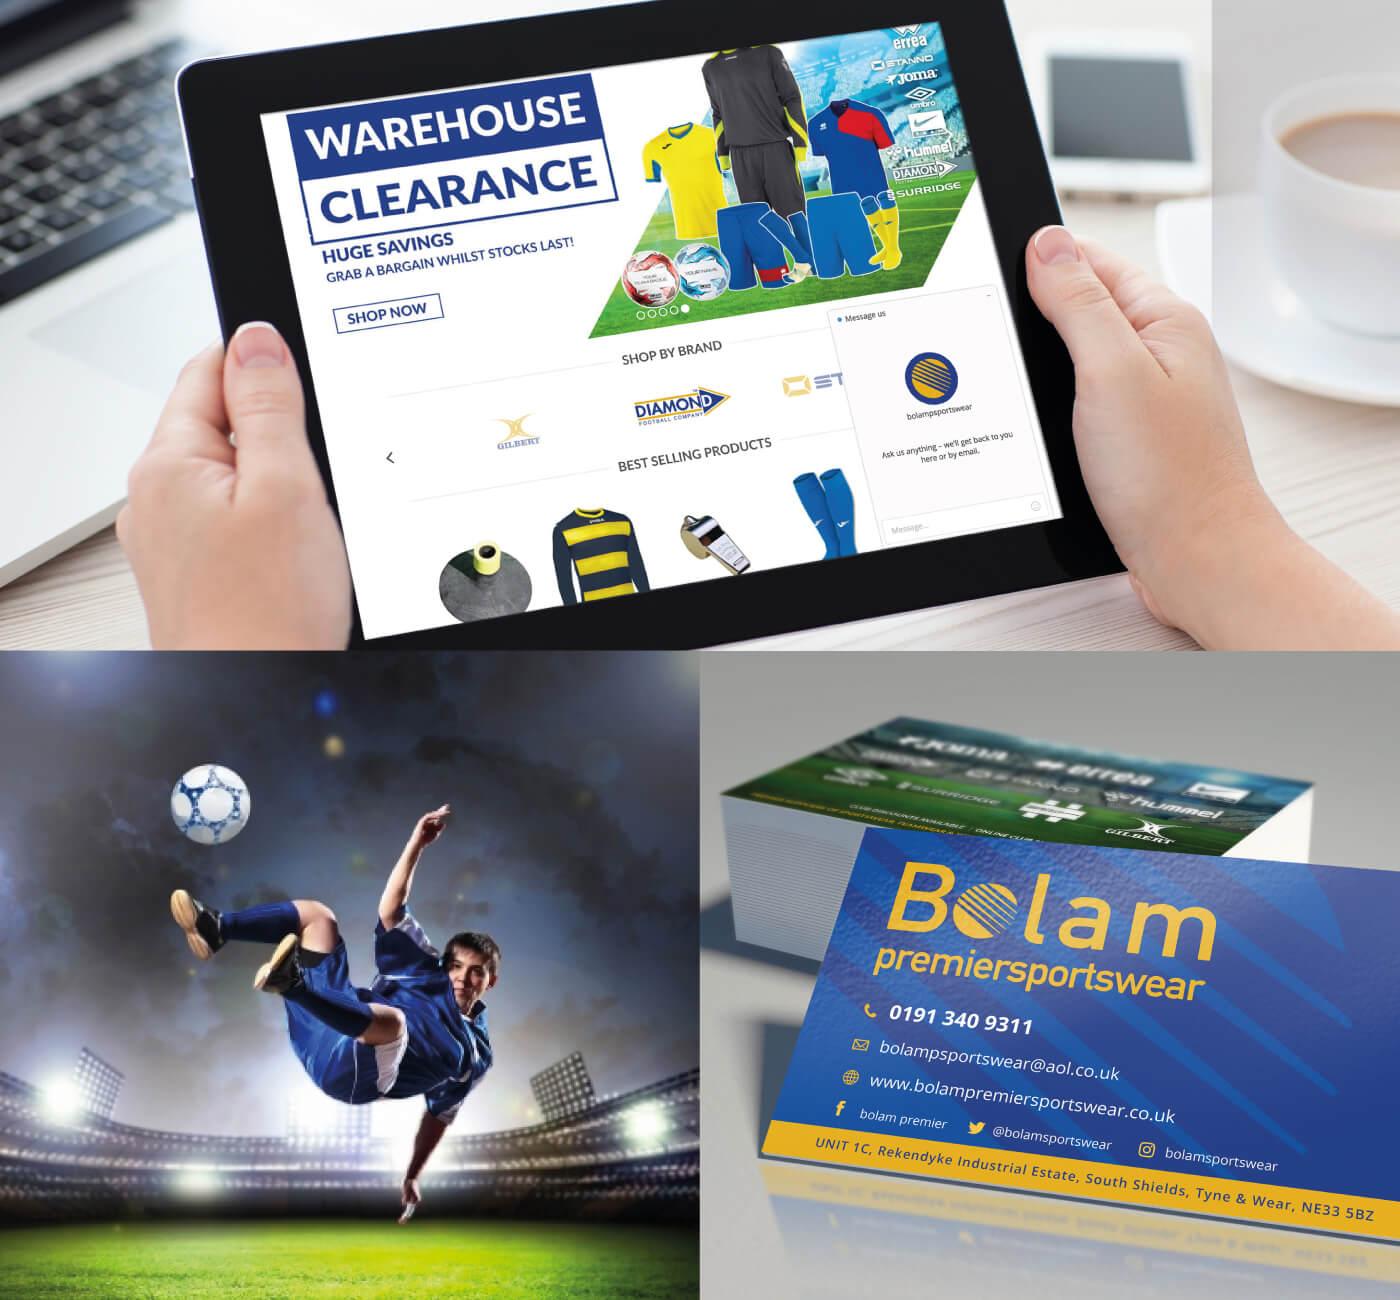 Bolam Premier Sportswear iPad in hand